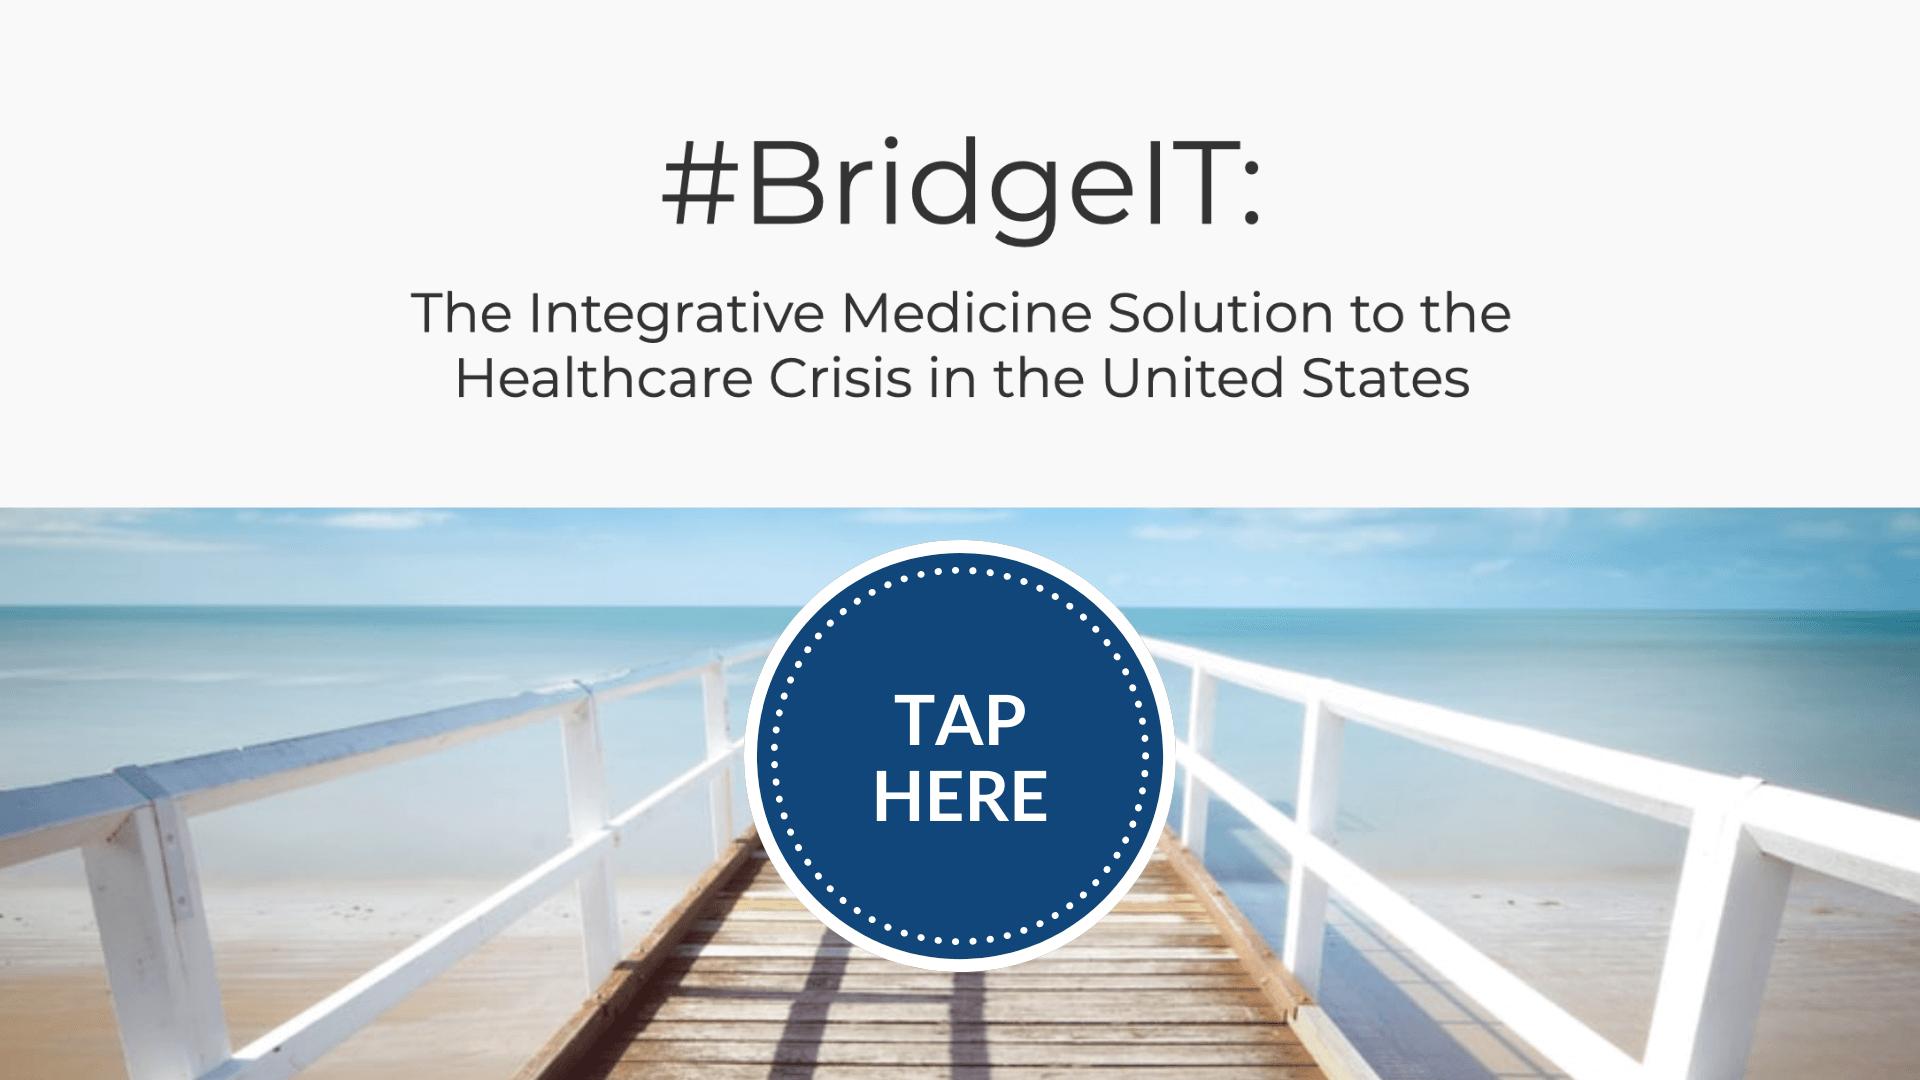 partner-with-holistic-health-org-bridgeit